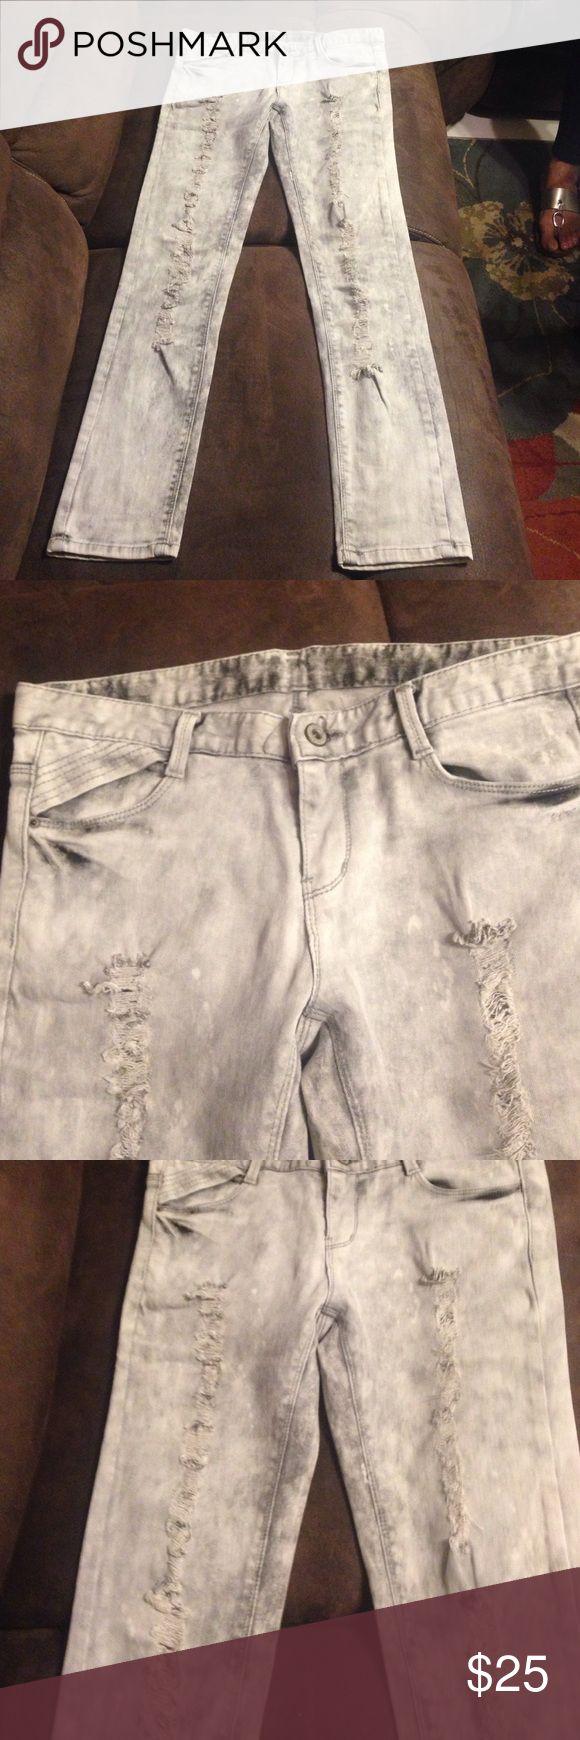 Jeans Light grey ripped jeans worn once Luke like new Jeans